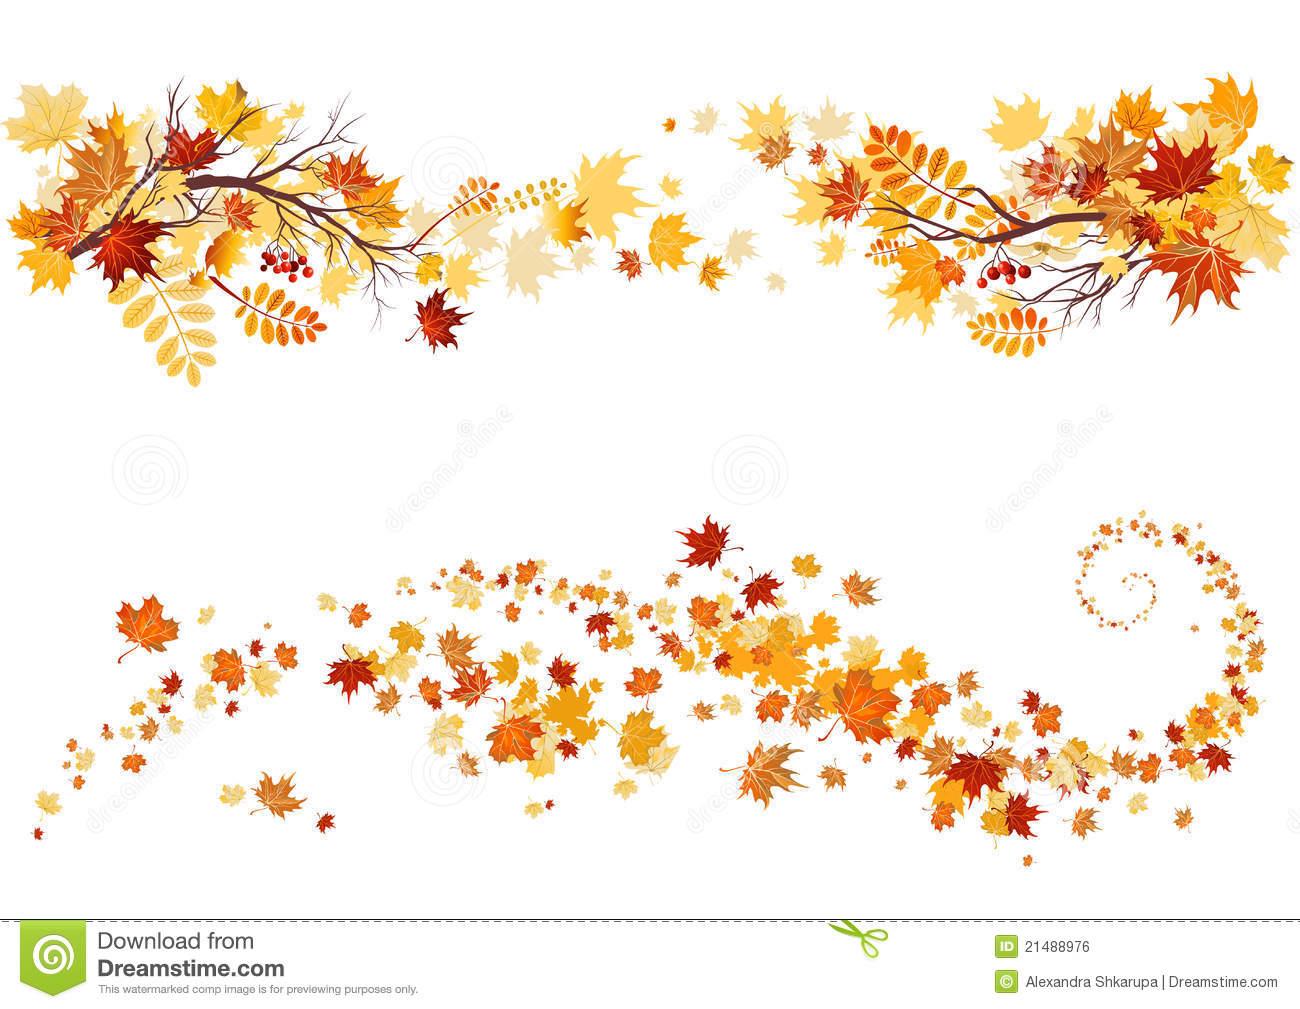 Autumn Leaves Border Royalty Free Stock -Autumn Leaves Border Royalty Free Stock Image Image 21488976-14